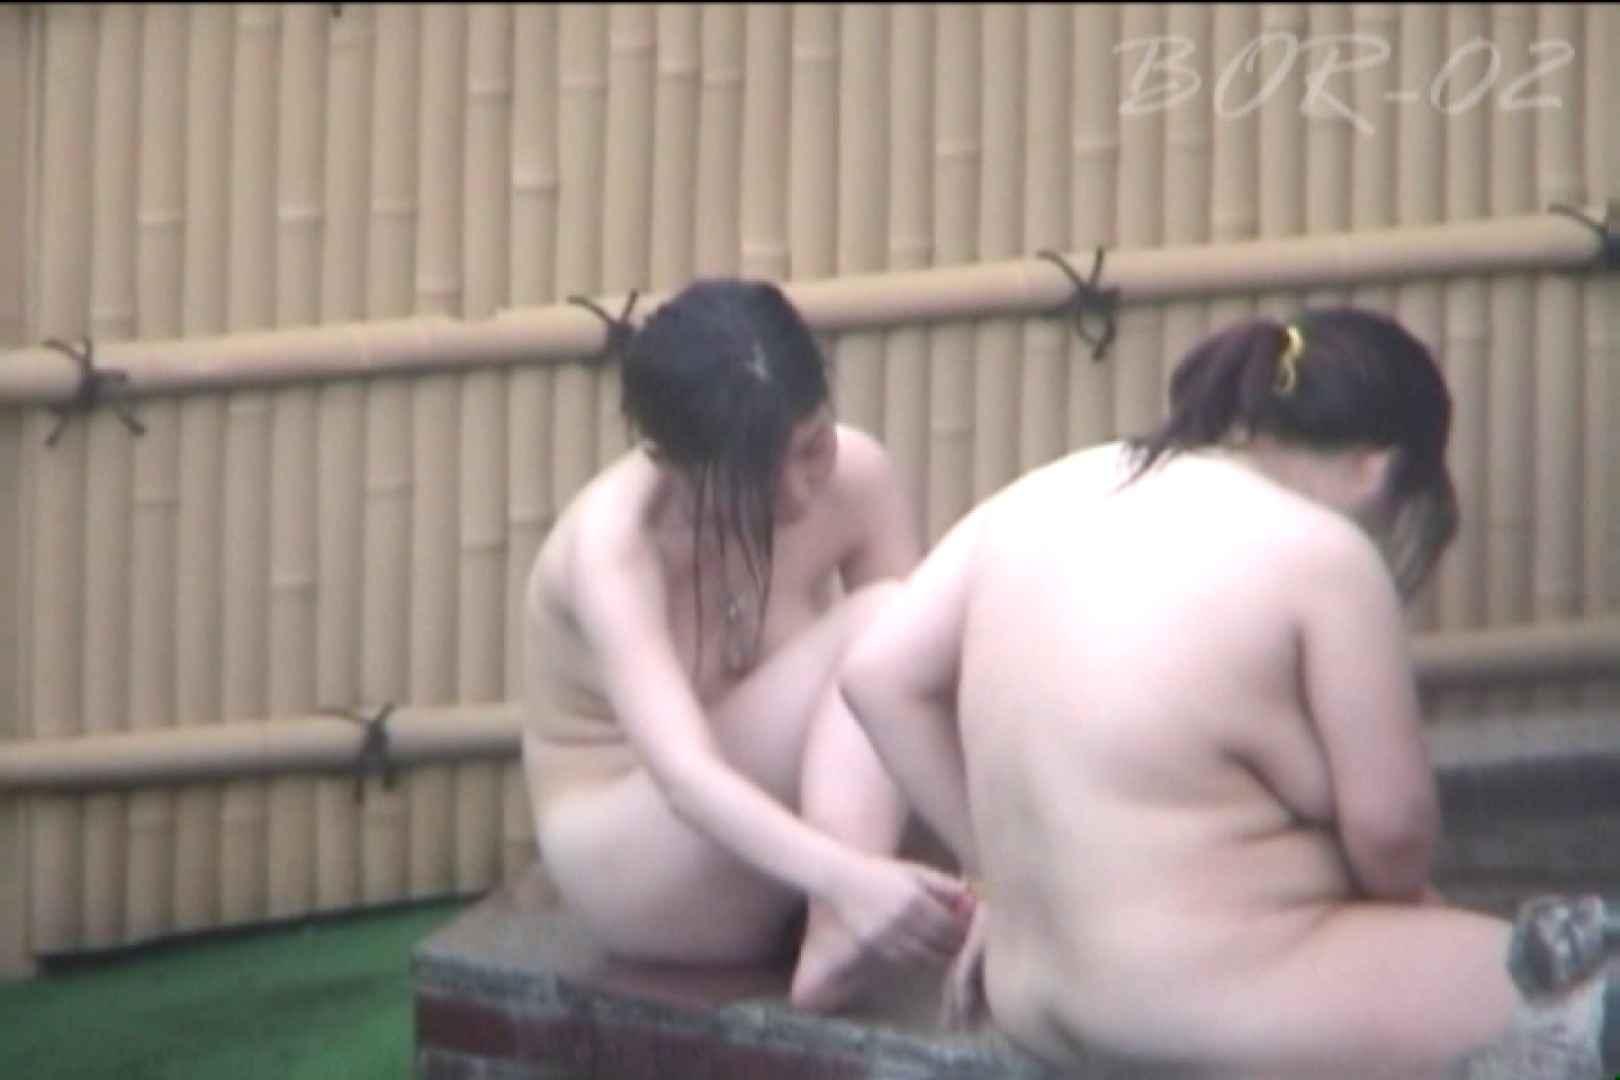 Aquaな露天風呂Vol.471 盗撮 | HなOL  66pic 7